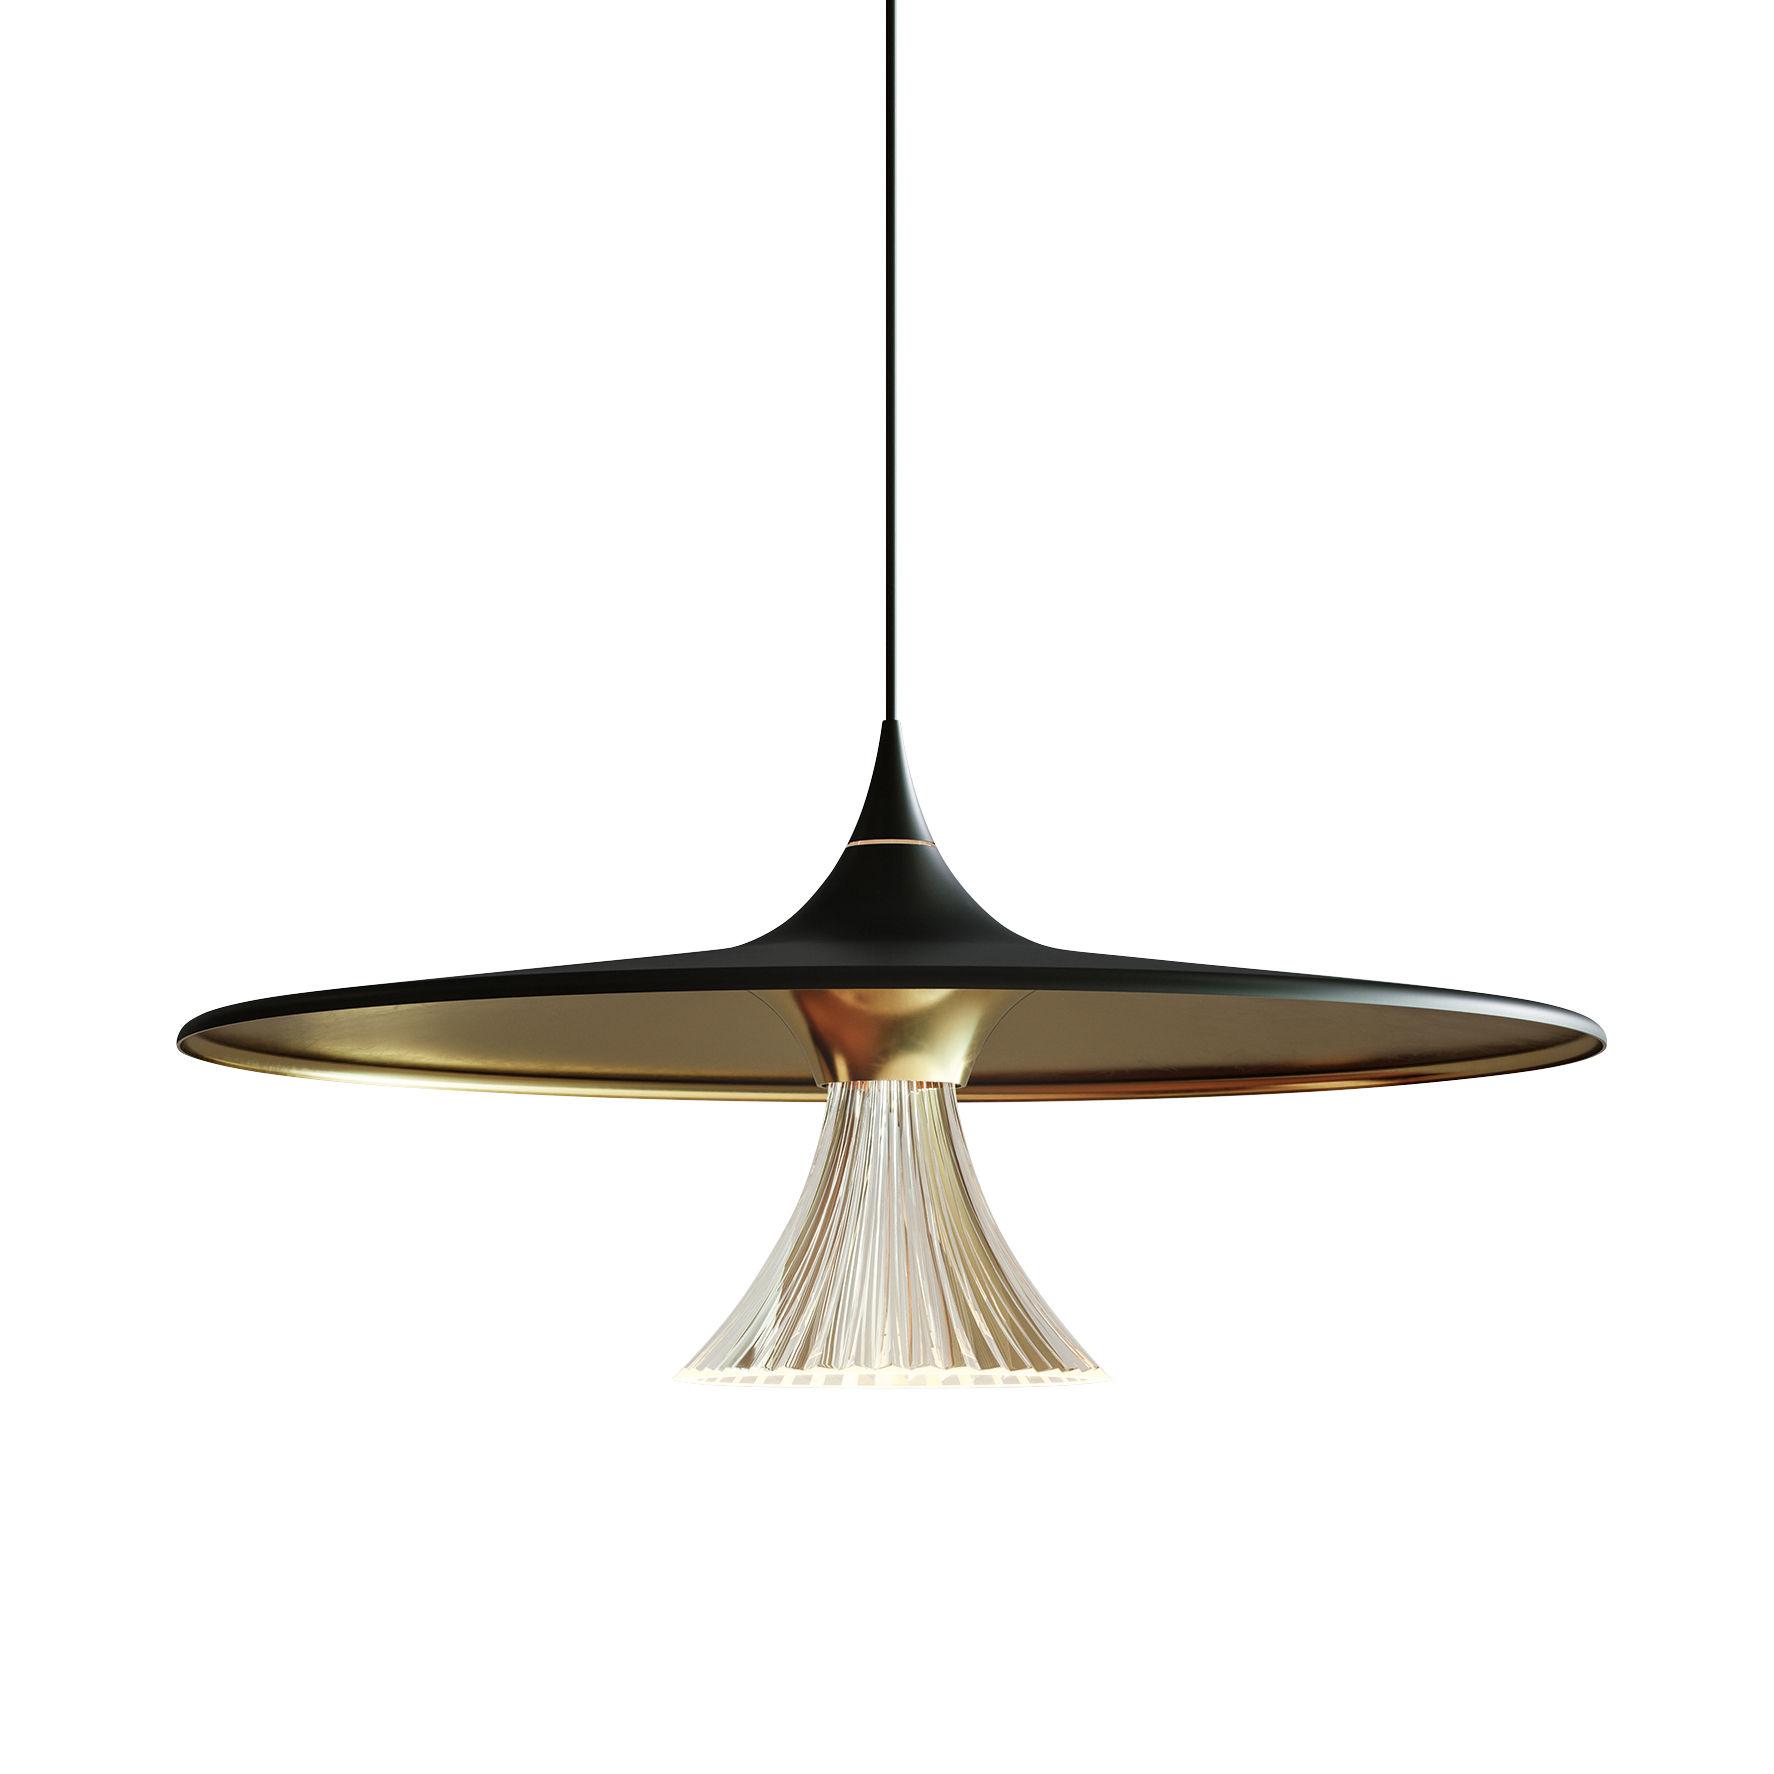 Leuchten - Pendelleuchten - Ipno Pendelleuchte / LED - Ø 62 cm - Artemide - Schwarz & goldfarben - bemaltes Aluminium, Methacrylate